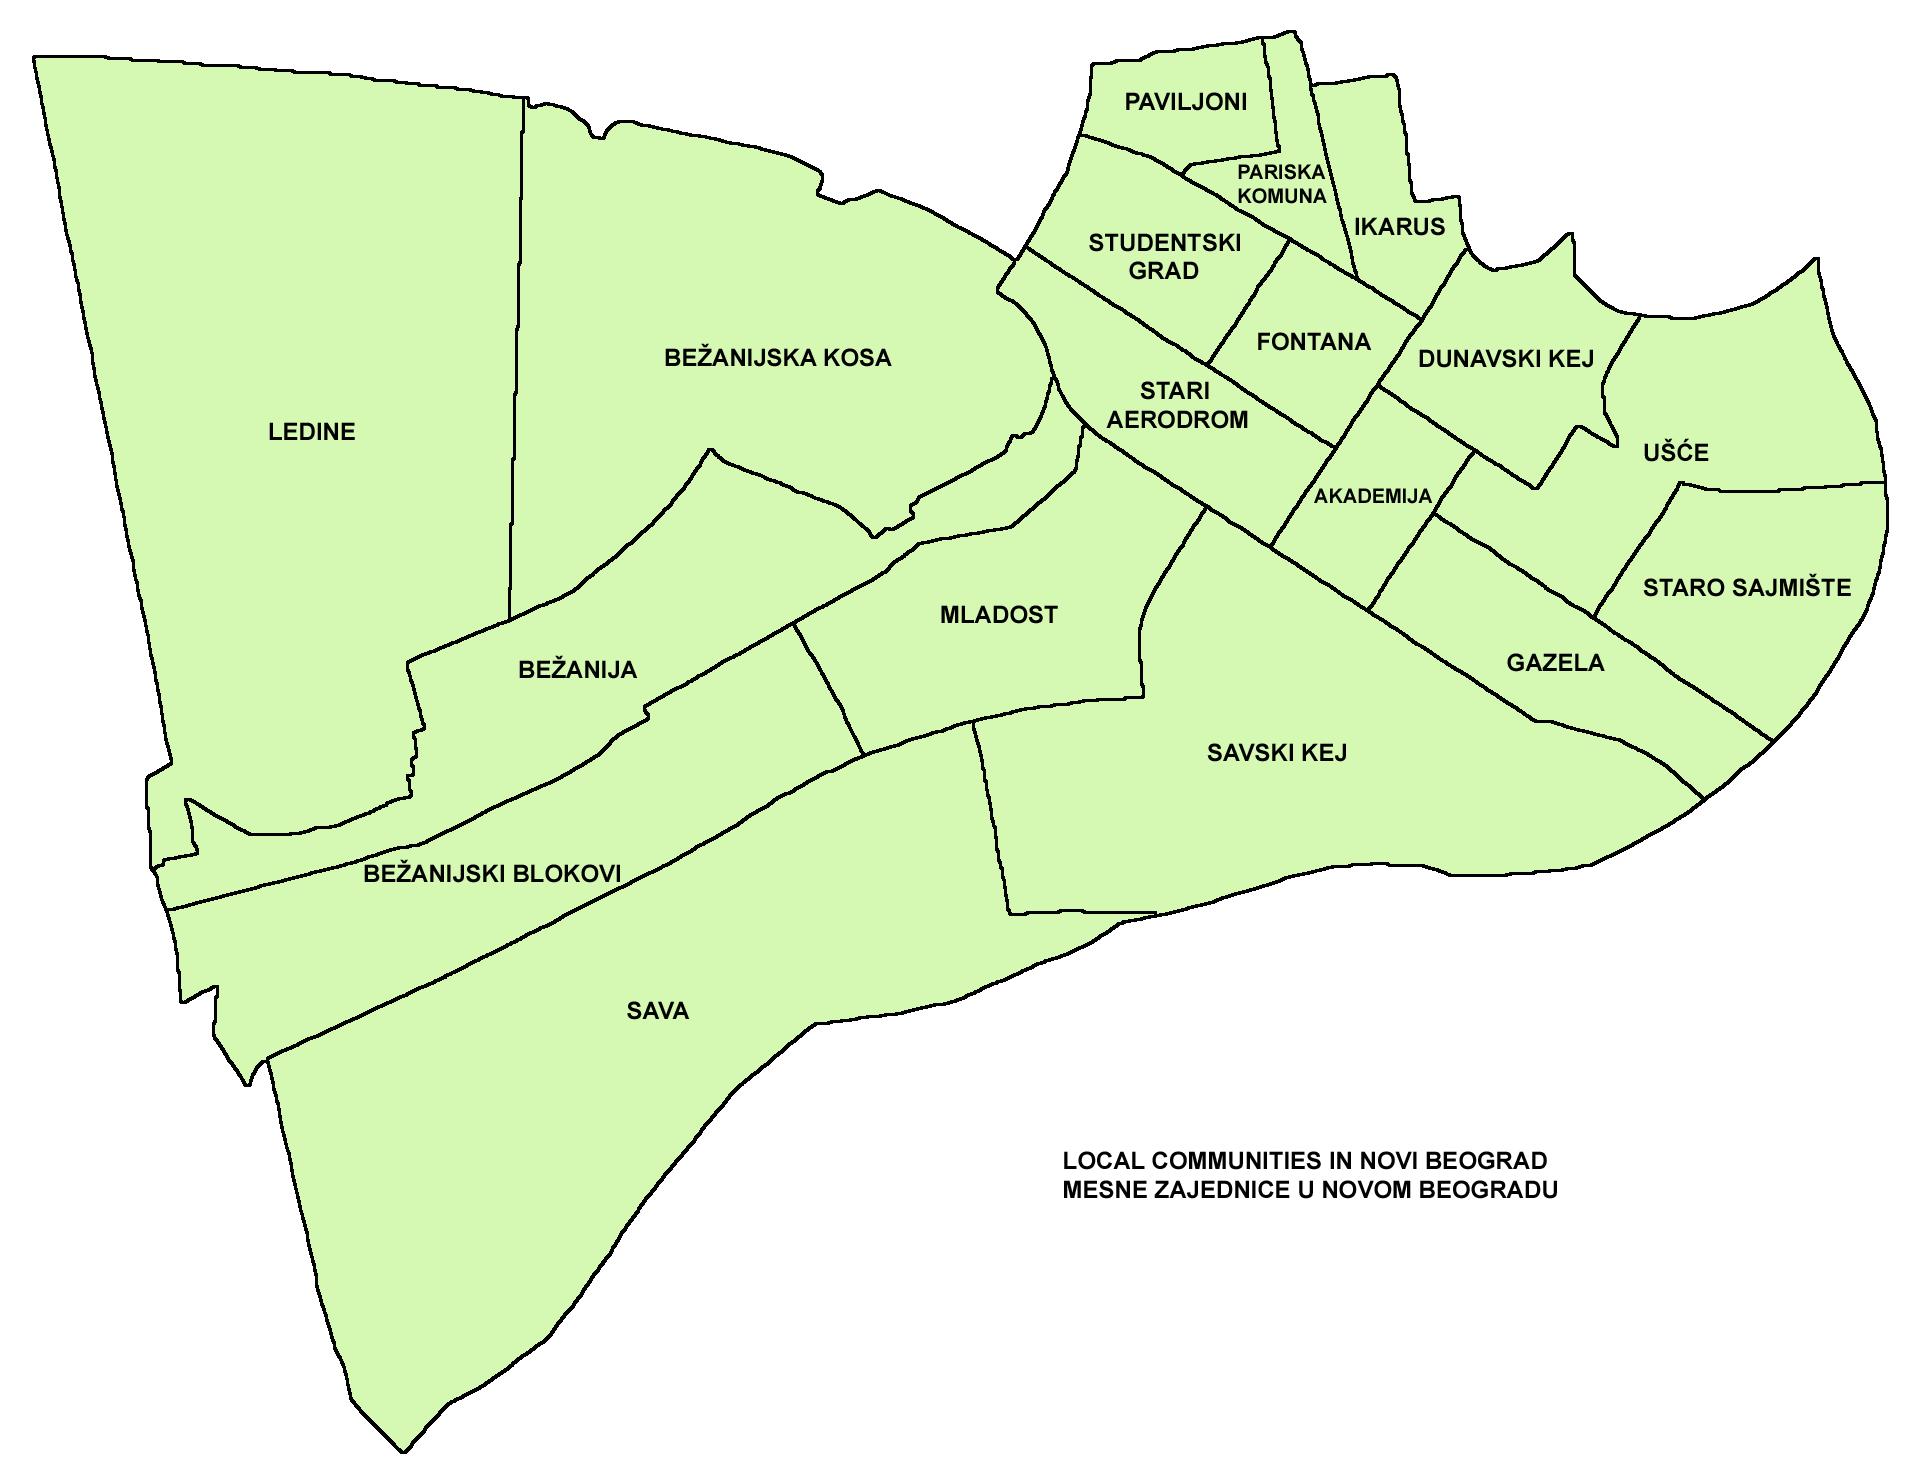 karta beograda novi beograd Mapa delova grada Beograda   BEOBUILD | FORUM karta beograda novi beograd